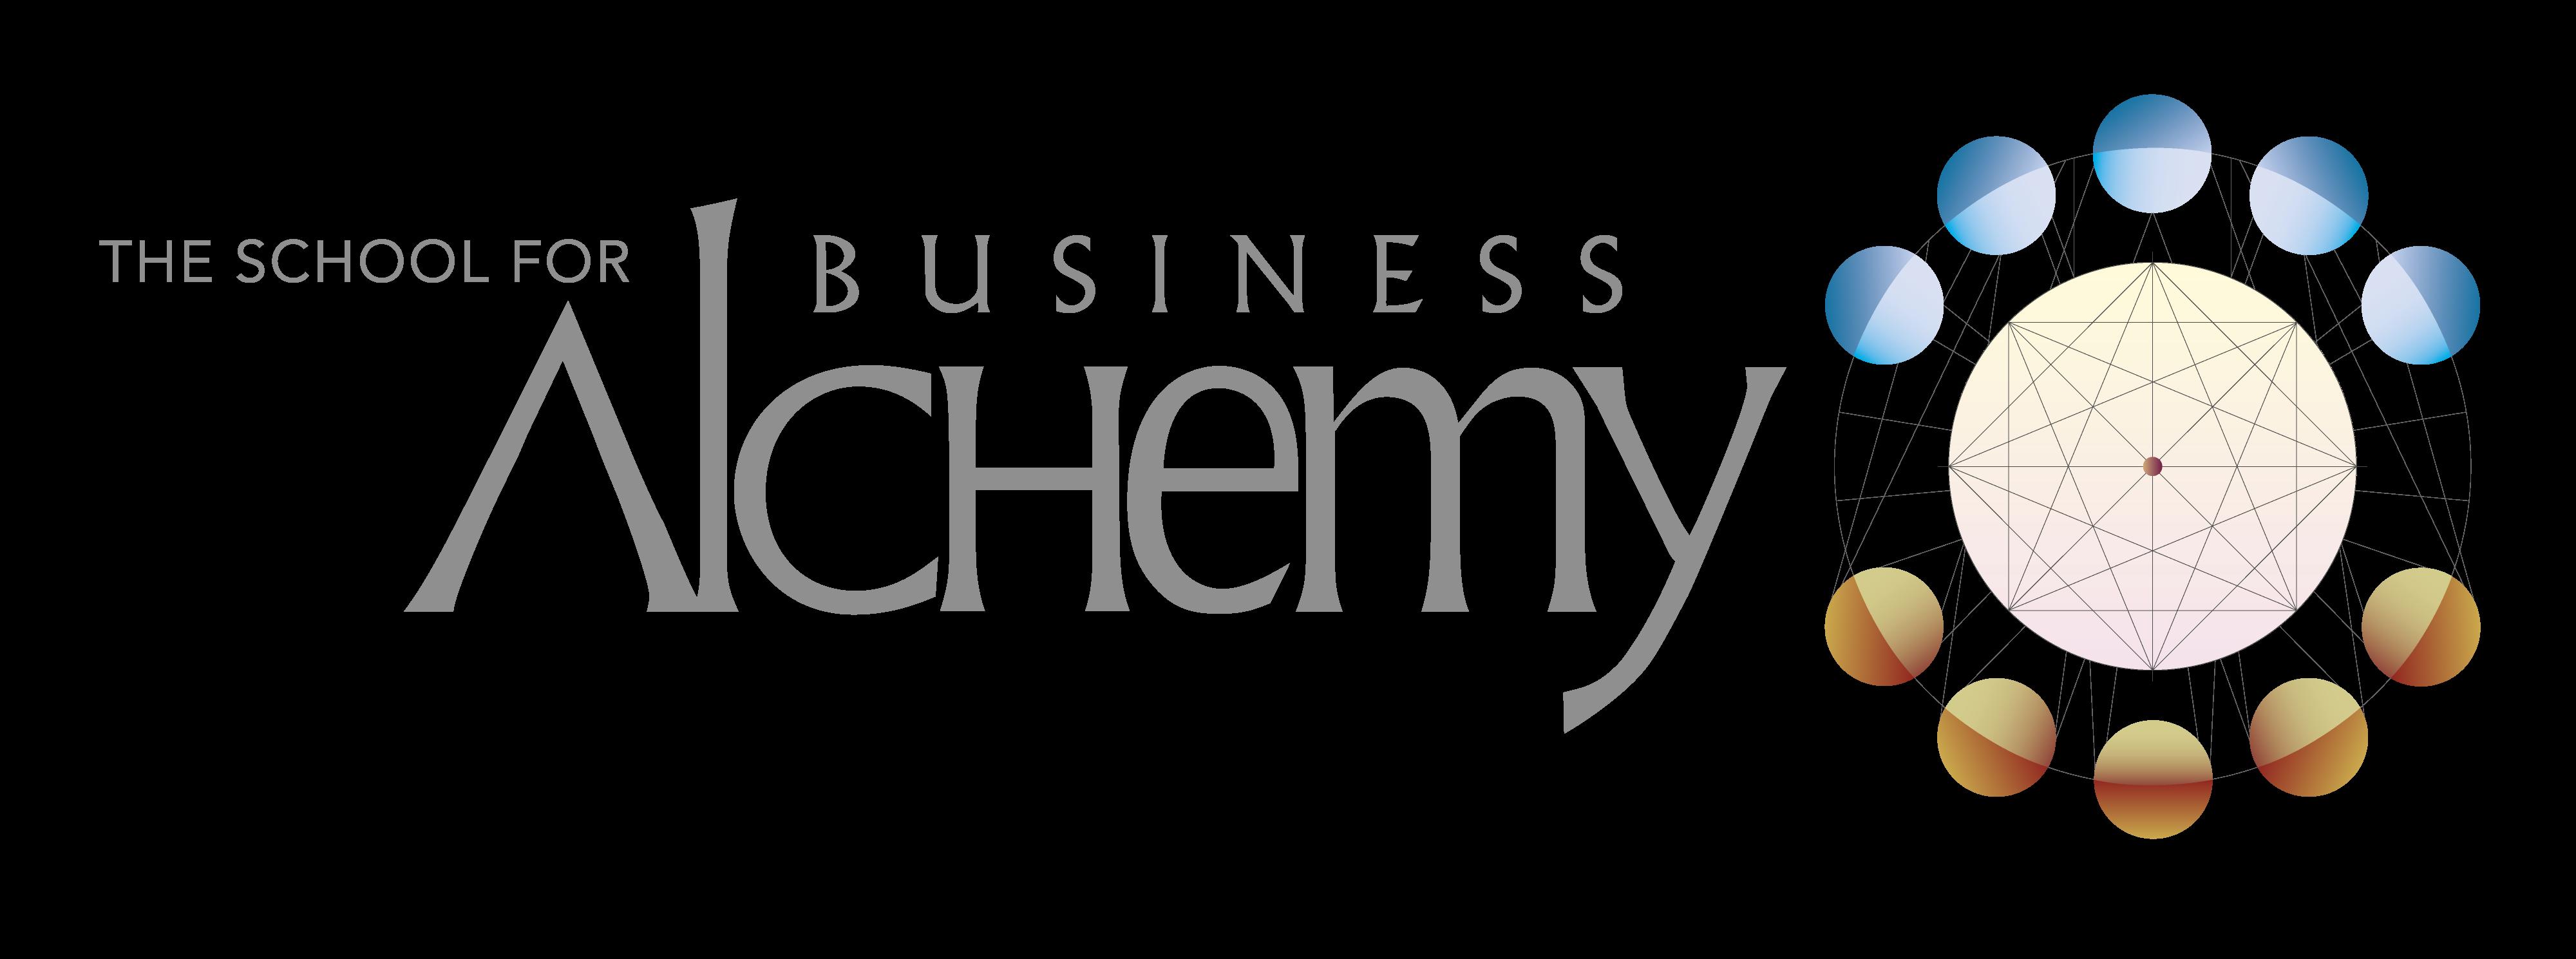 School for Business Alchemy